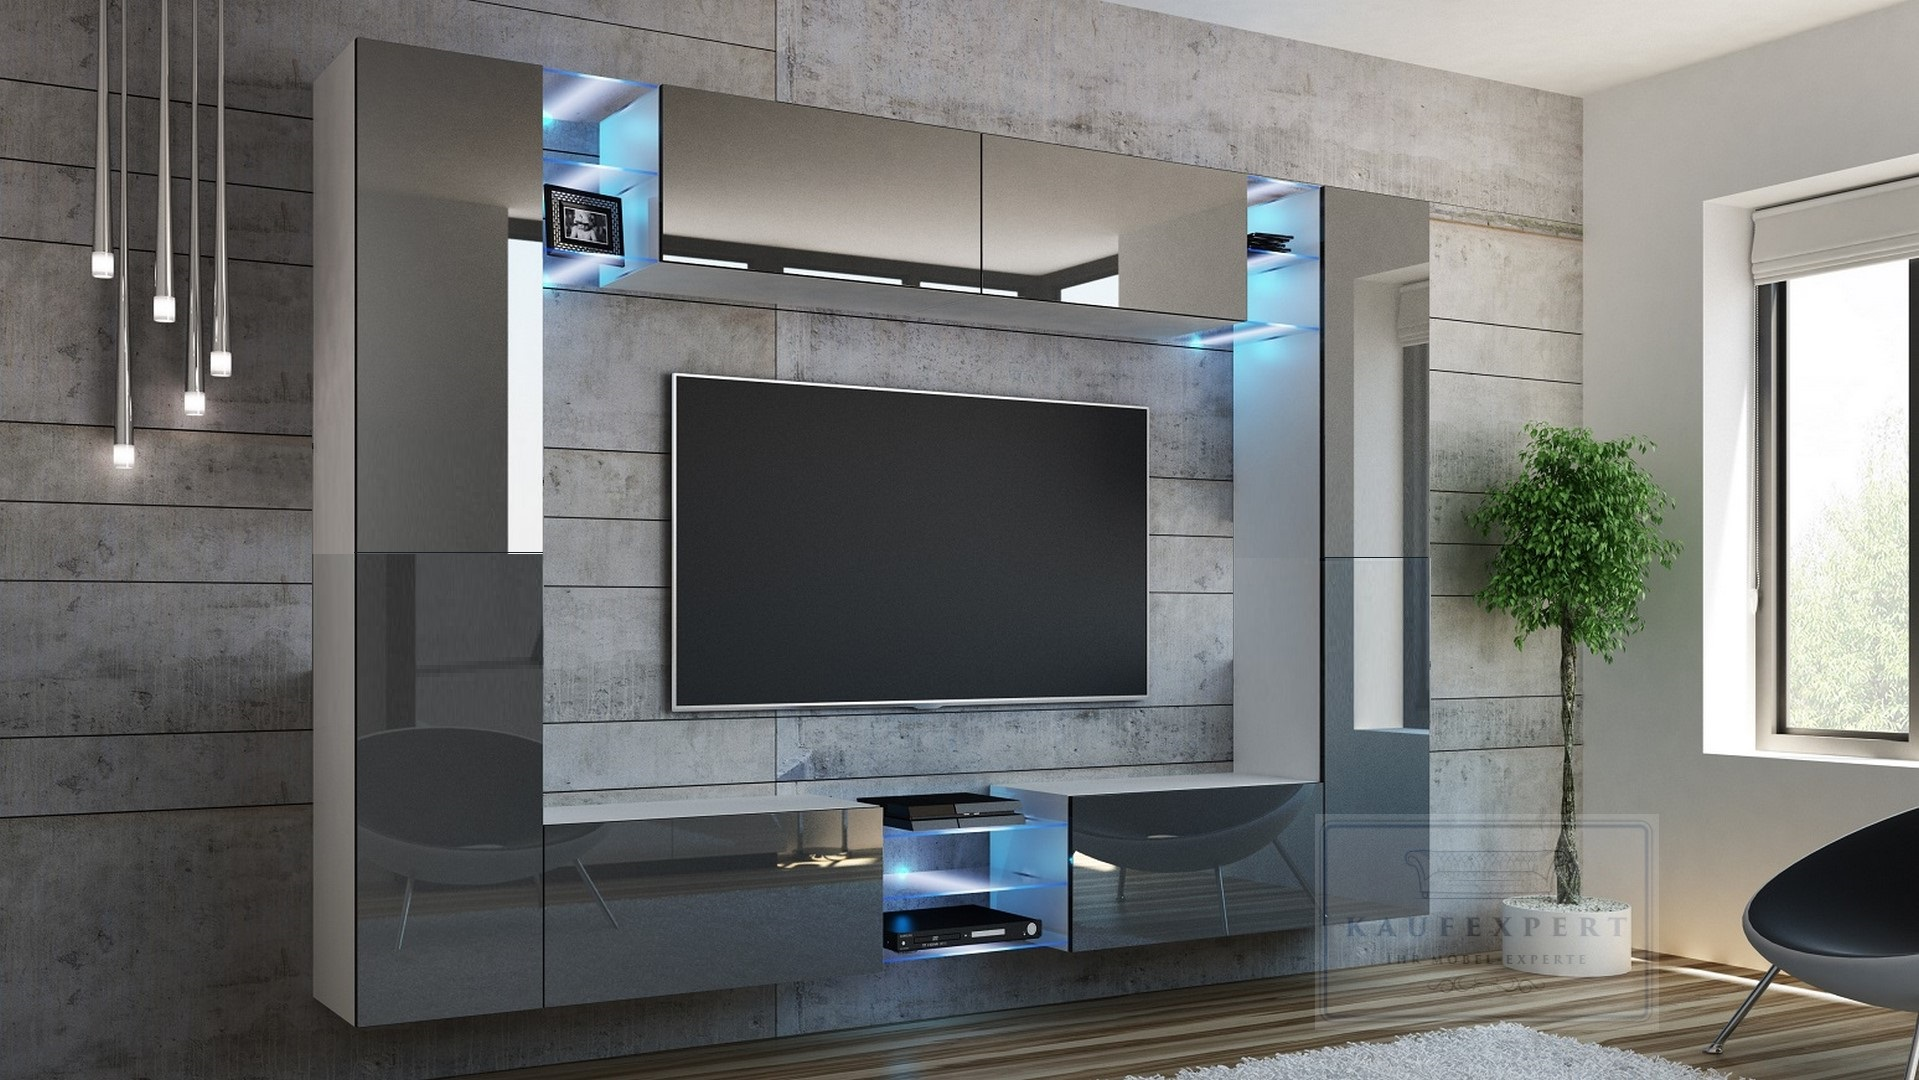 kaufexpert wohnwand kino grau hochglanz wei mediawand medienwand design modern led. Black Bedroom Furniture Sets. Home Design Ideas